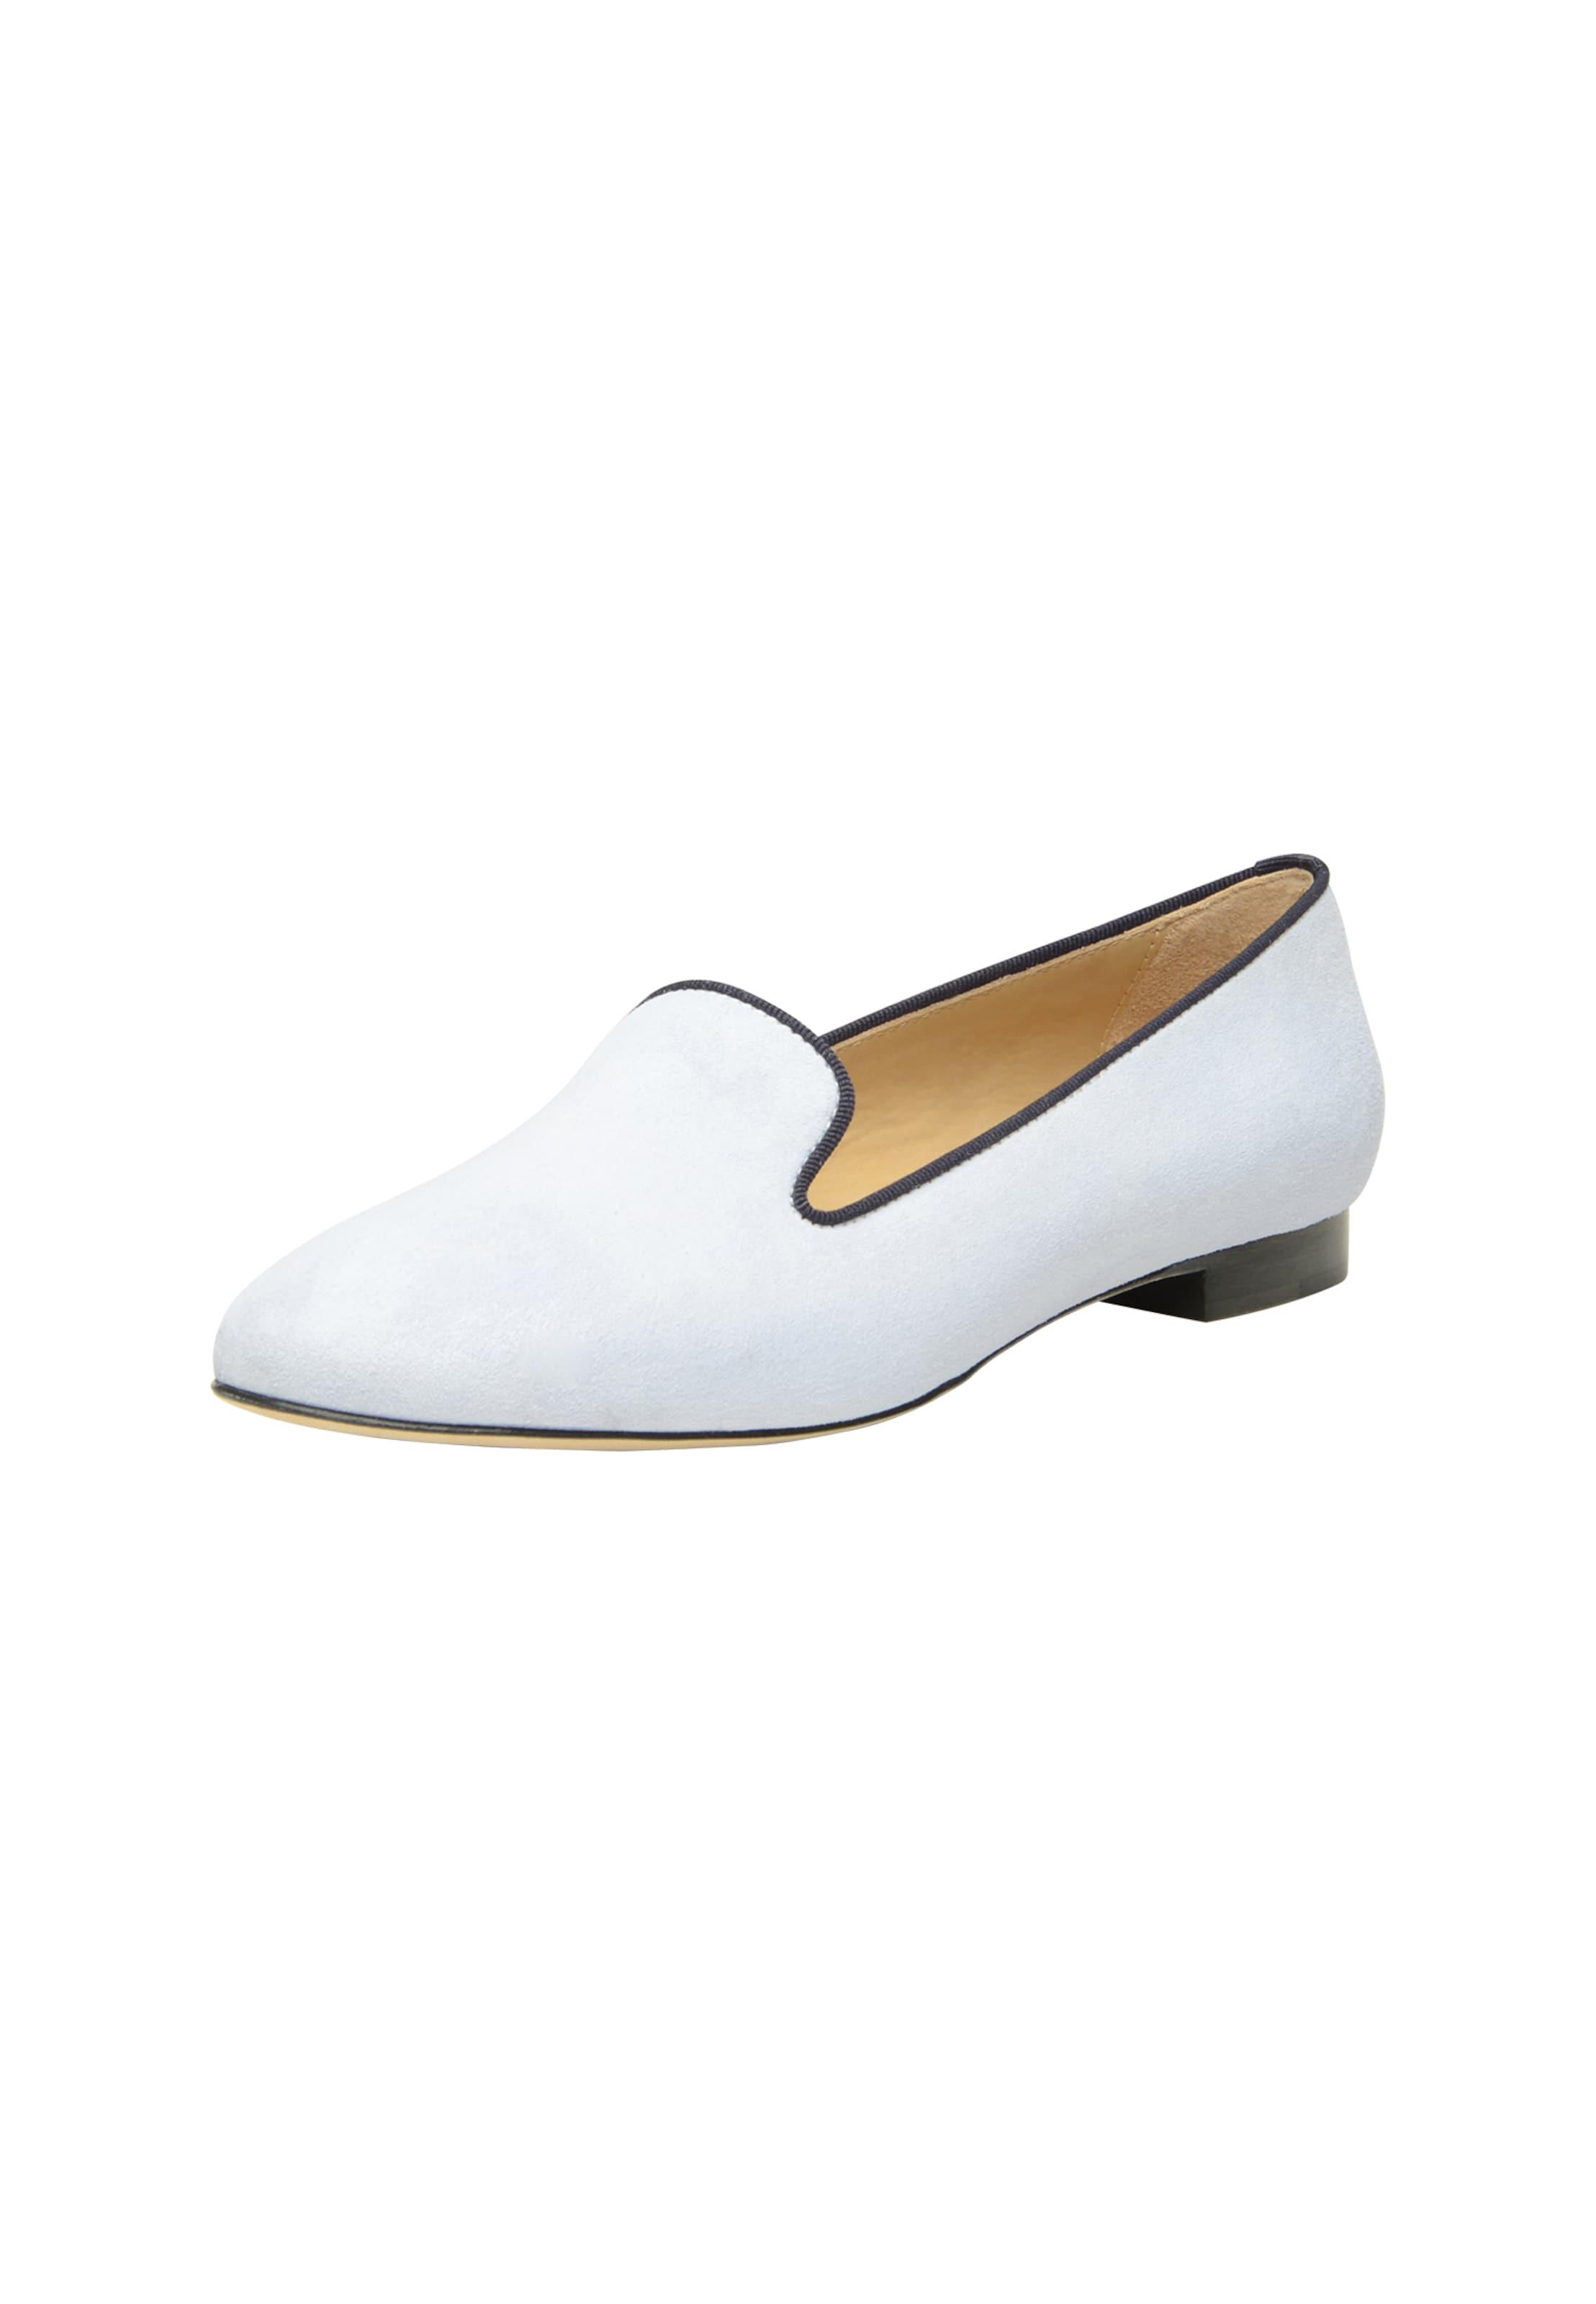 SHOEPASSION Loafer No. 26 WL Hohe Qualität